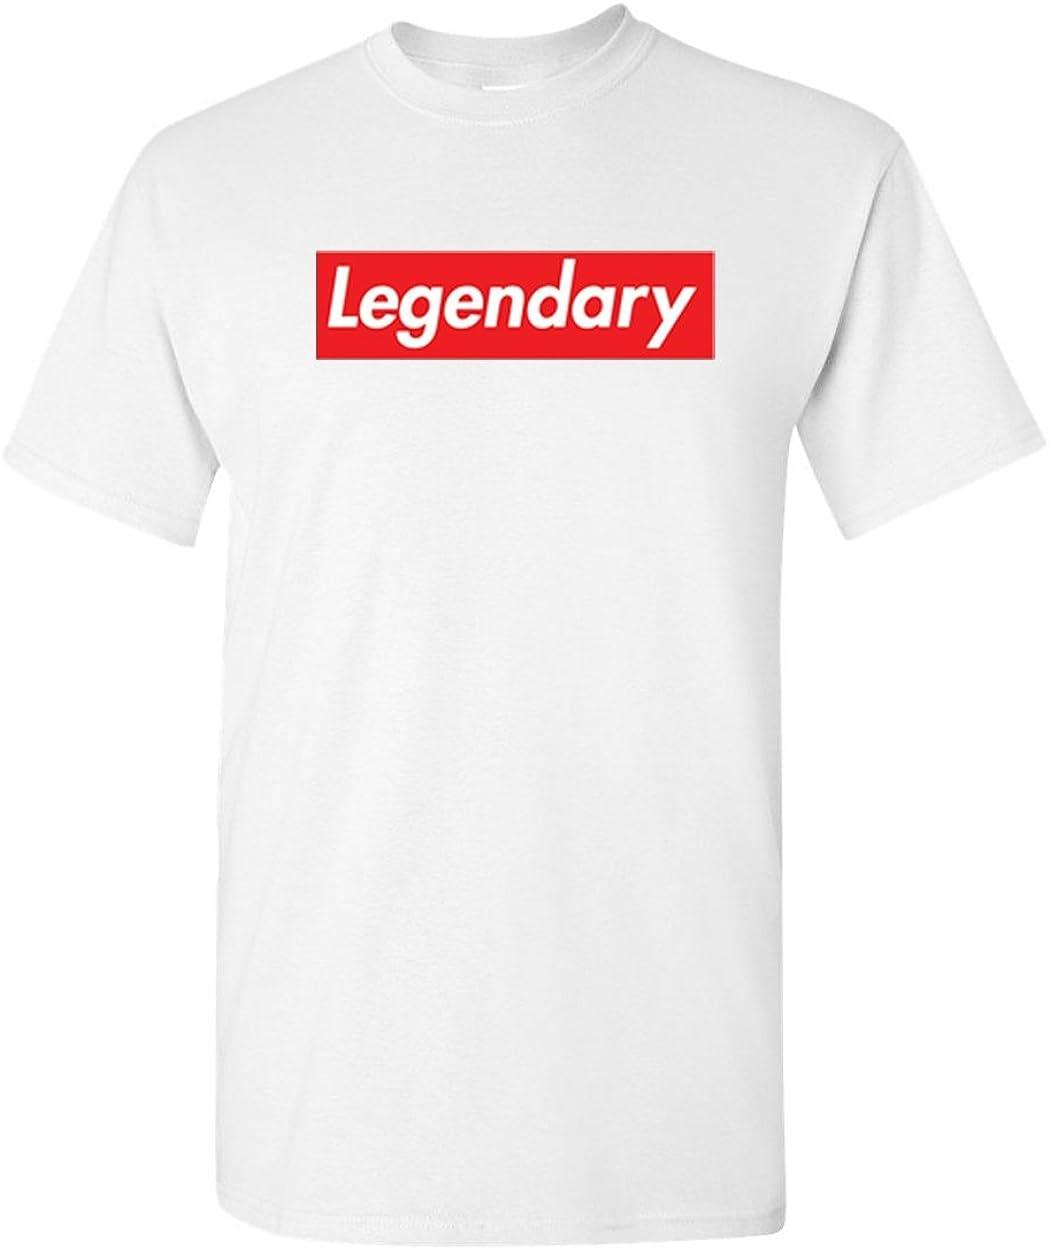 3X, Black Legendary Box T Shirt Supreme Legendary t Shirt